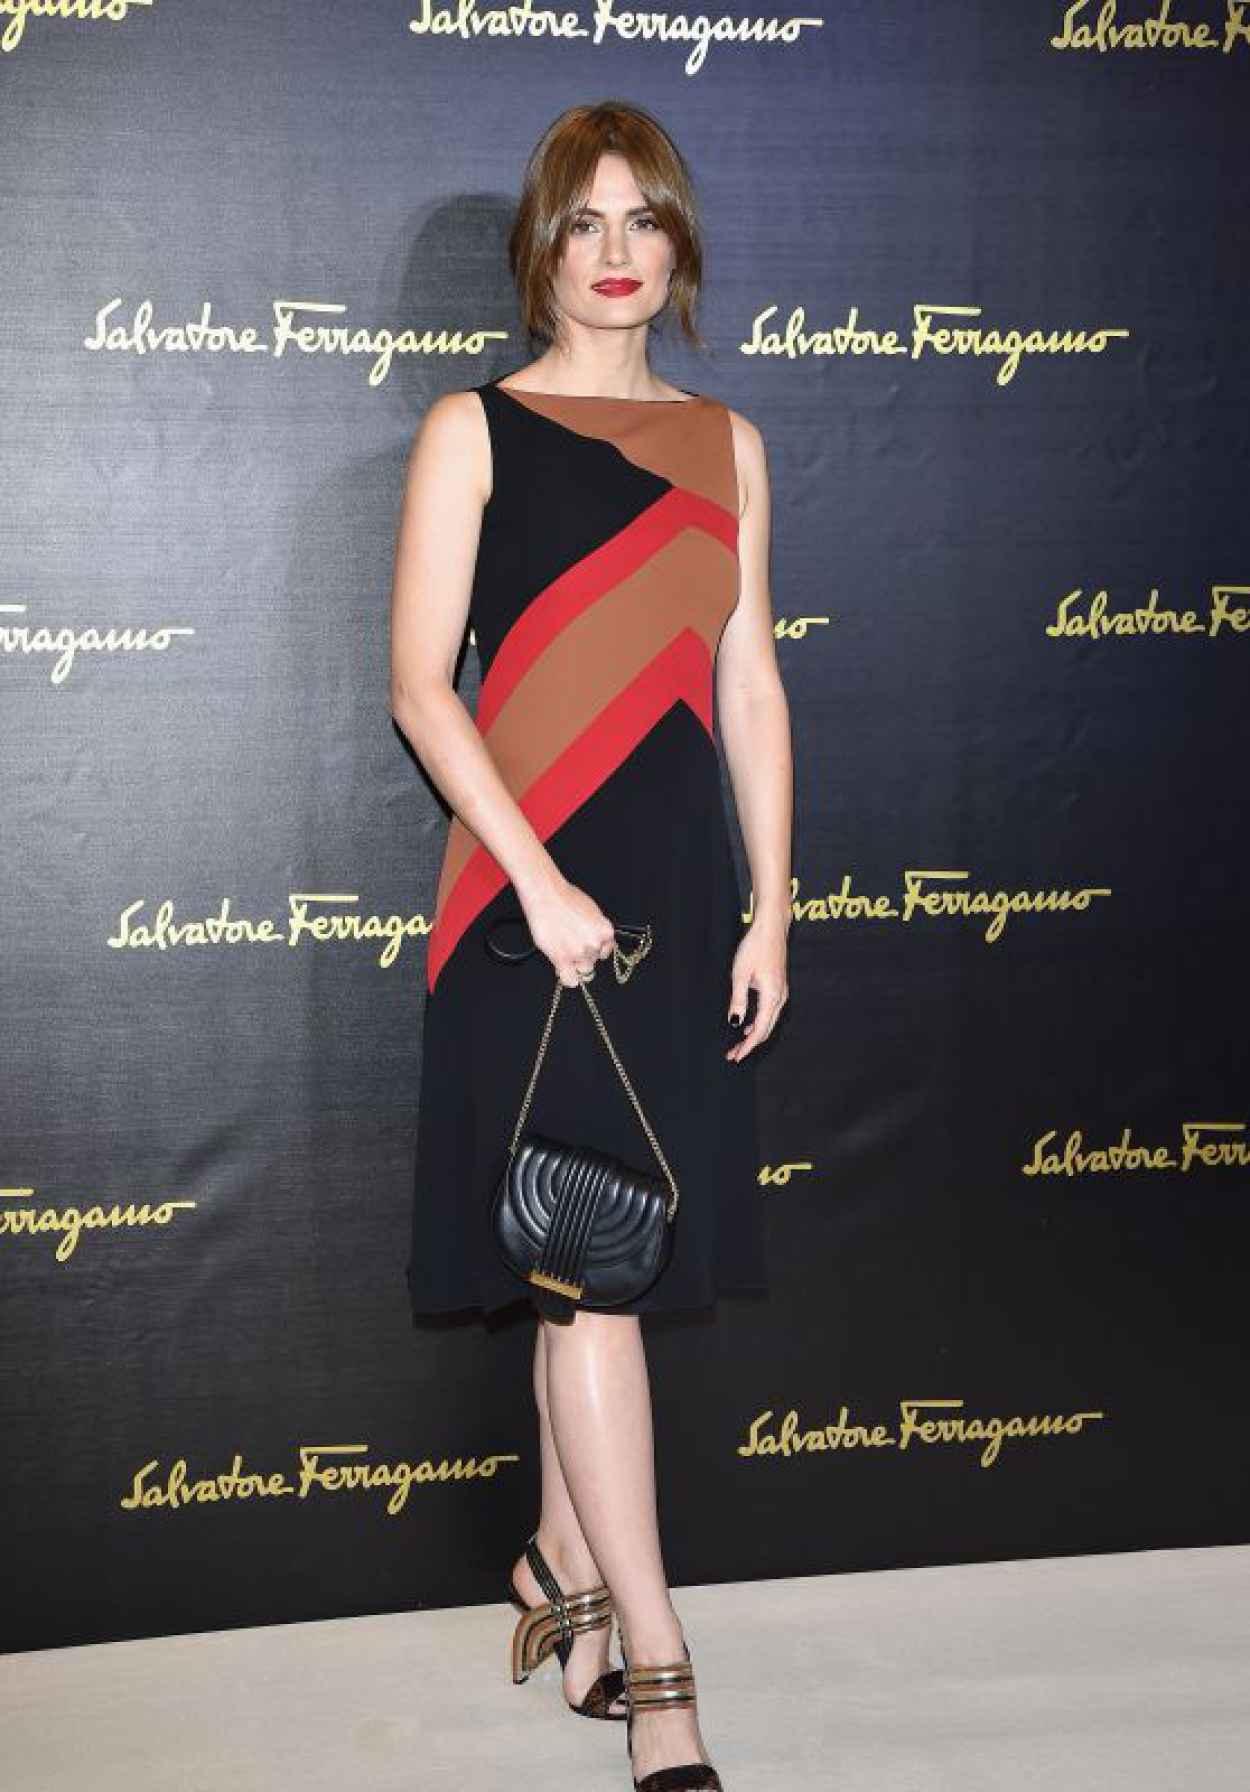 Stana Katic - Salvatore Ferragamo - Milan Fashion Week SS16-1